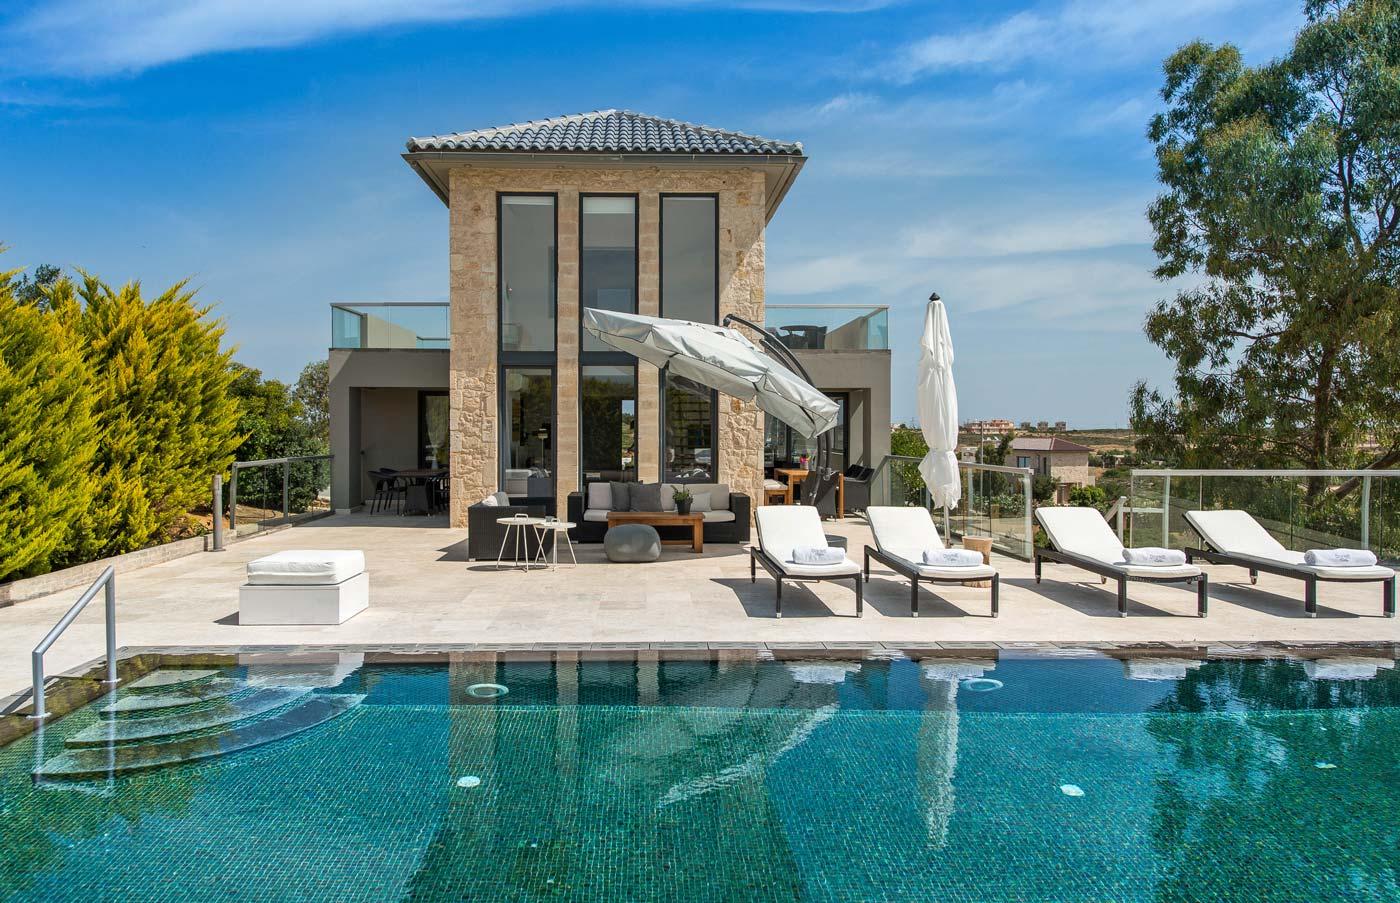 Sea view av athena villas i tersanas   thehotel.gr